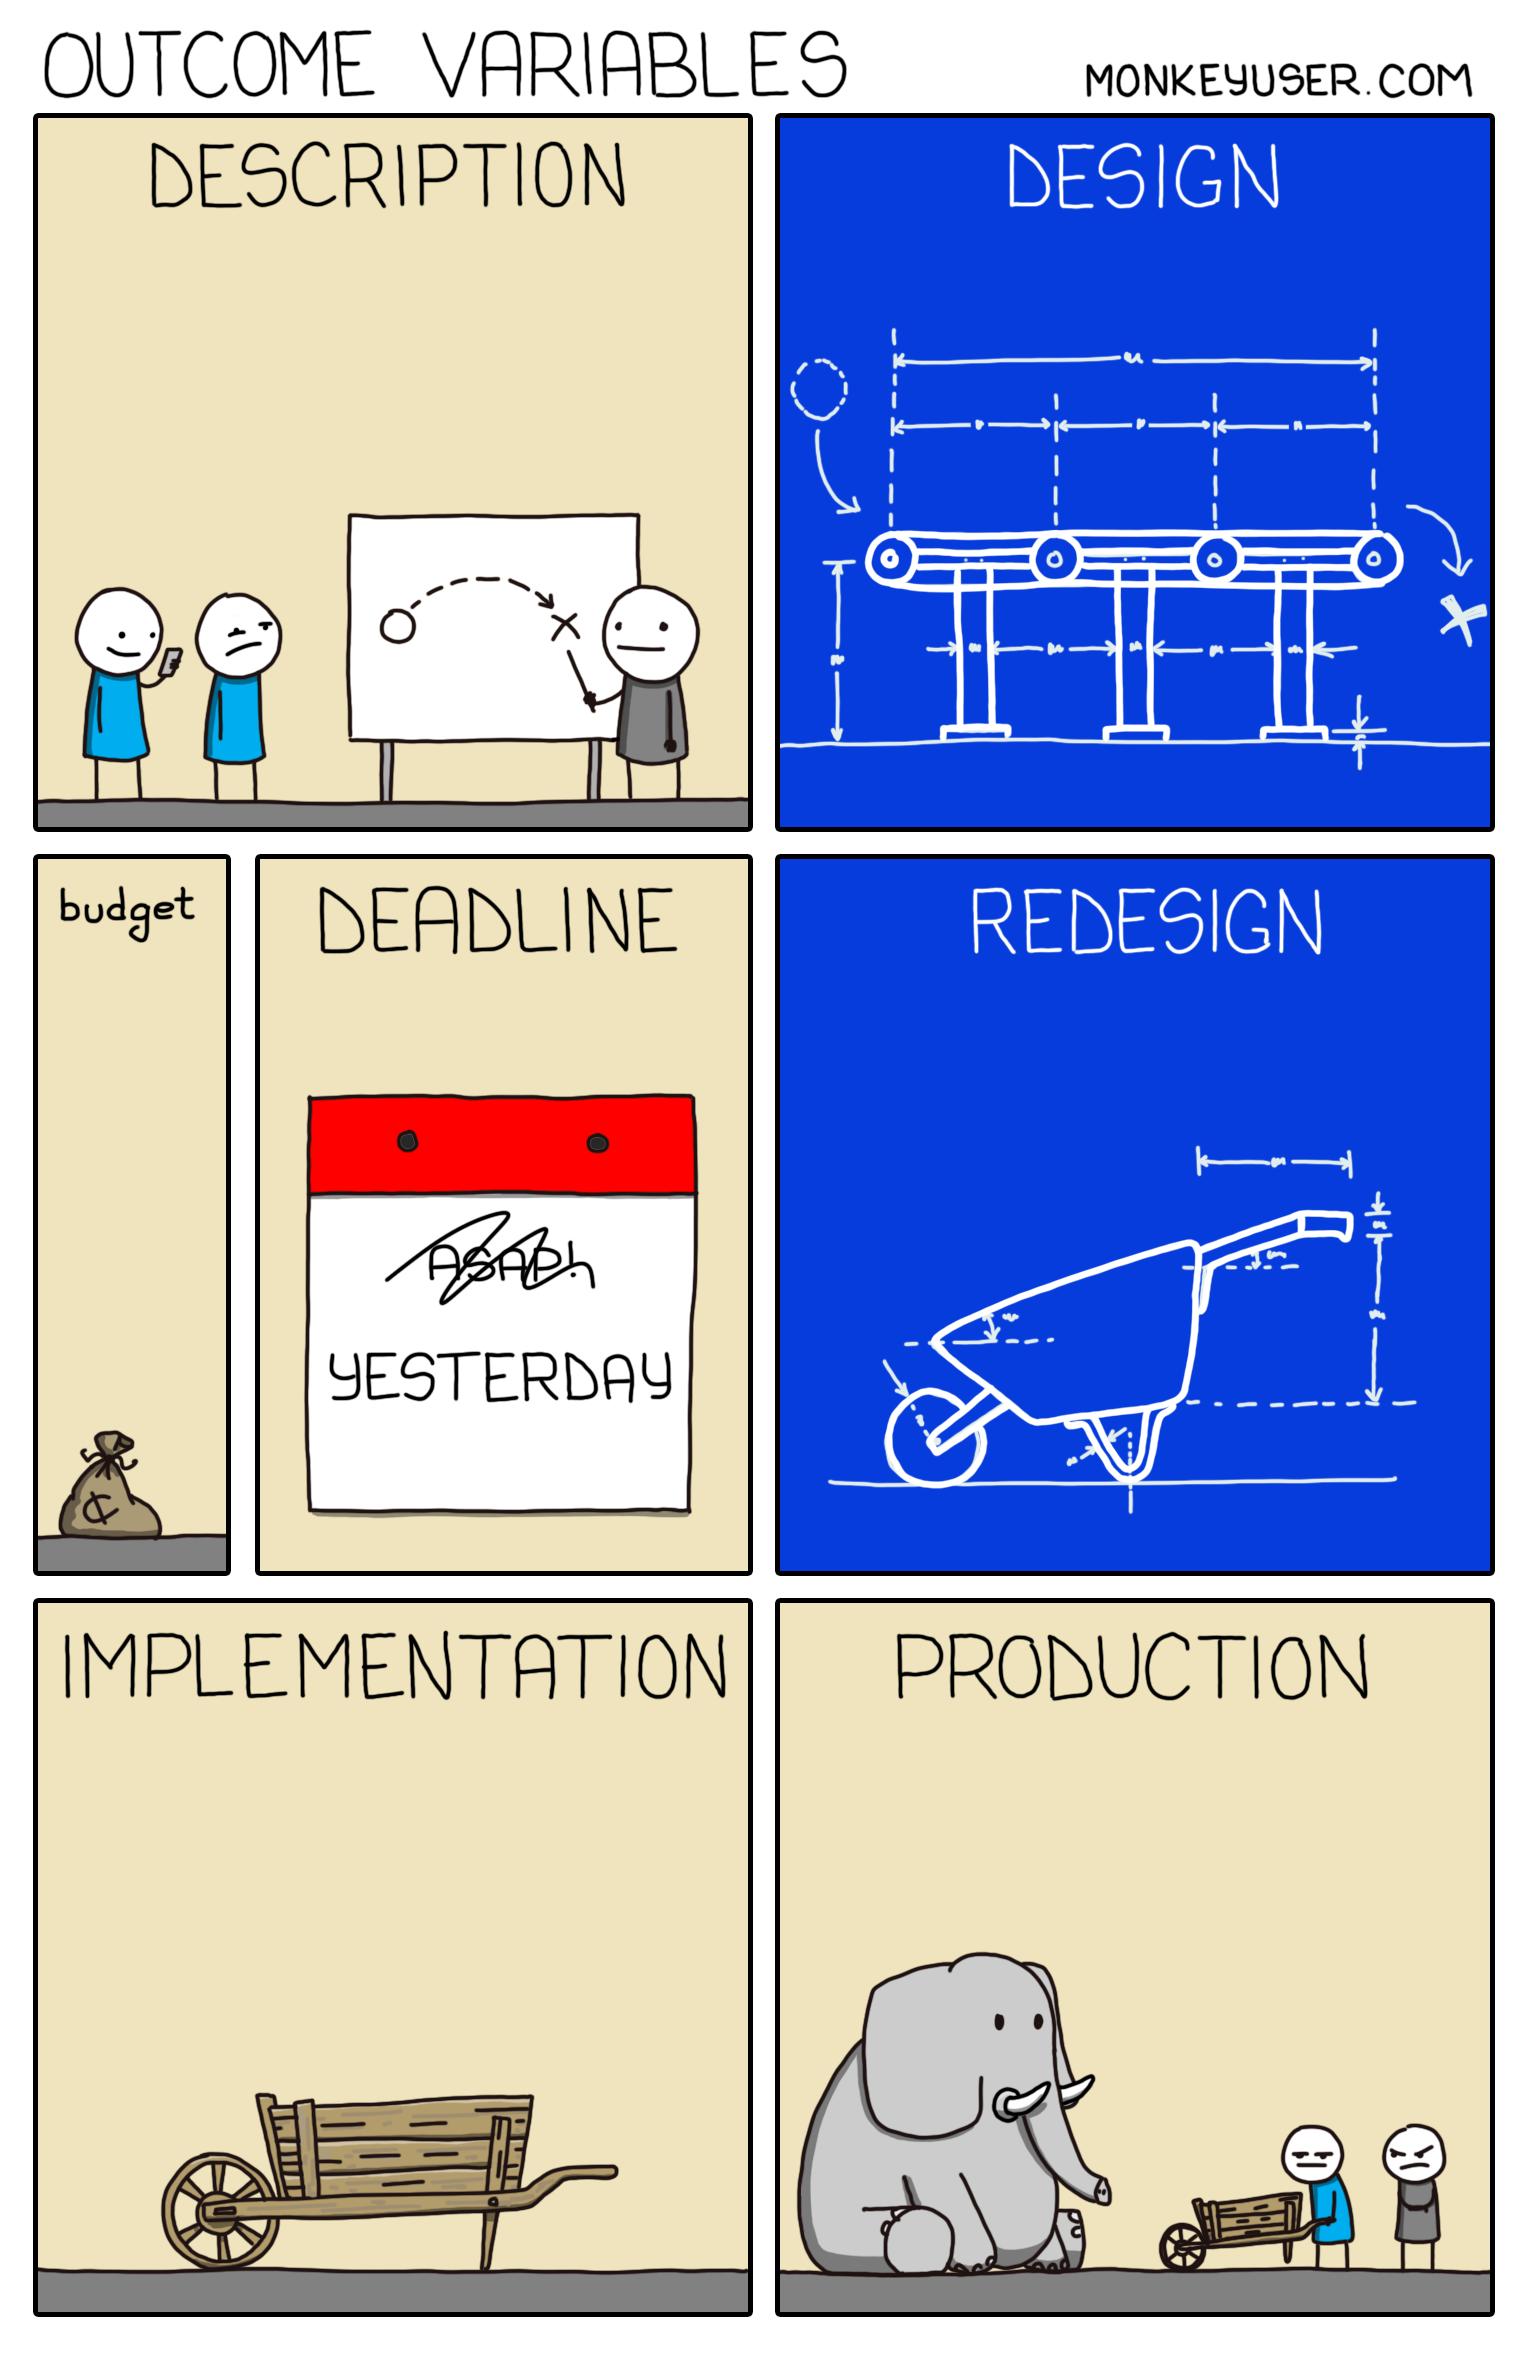 Outcome variables